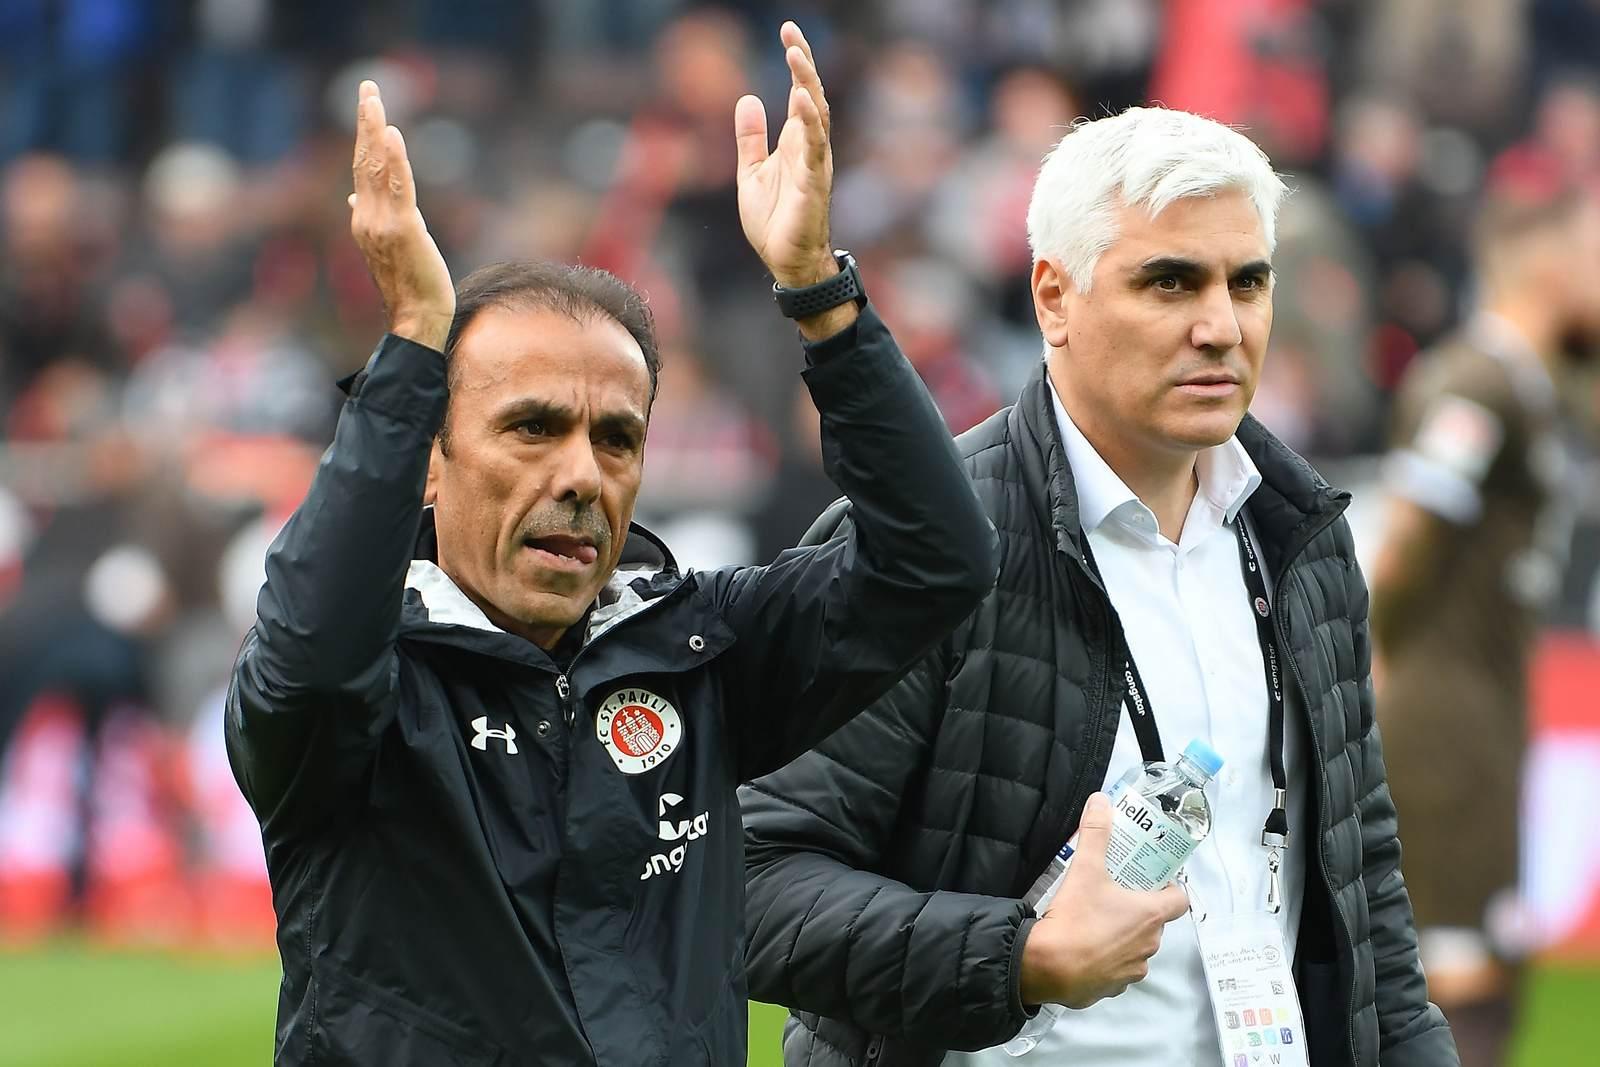 Jos Luhukay und Andreas Bornemann beim FC St. Pauli